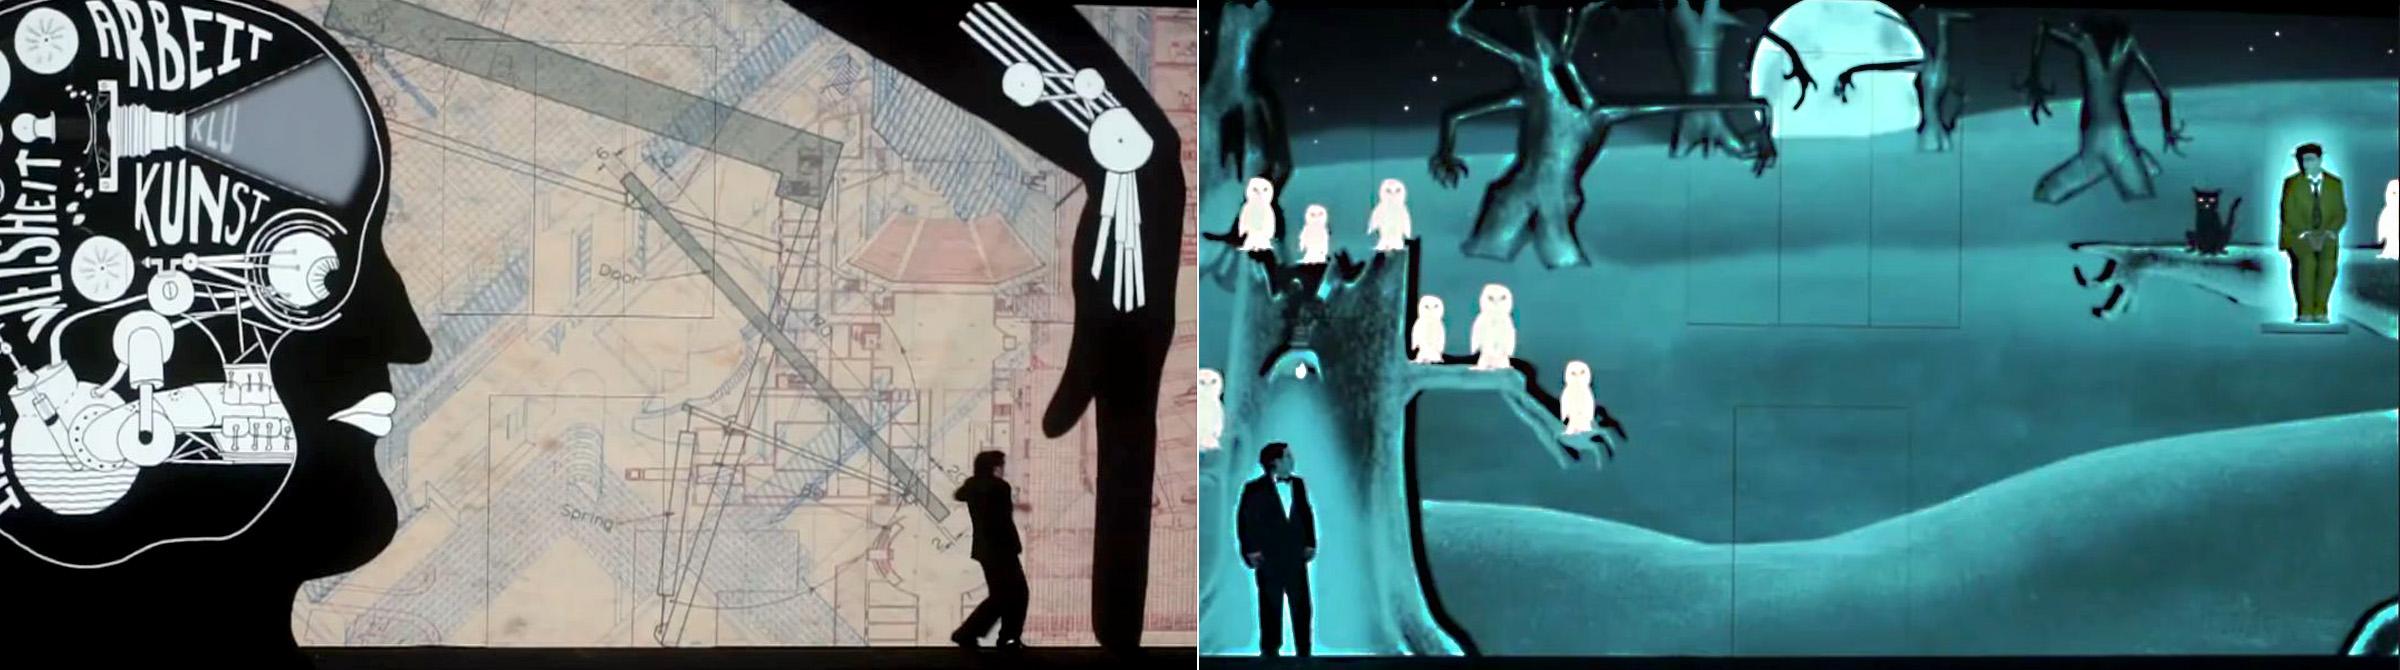 Fotogramas del vídeo promocional.